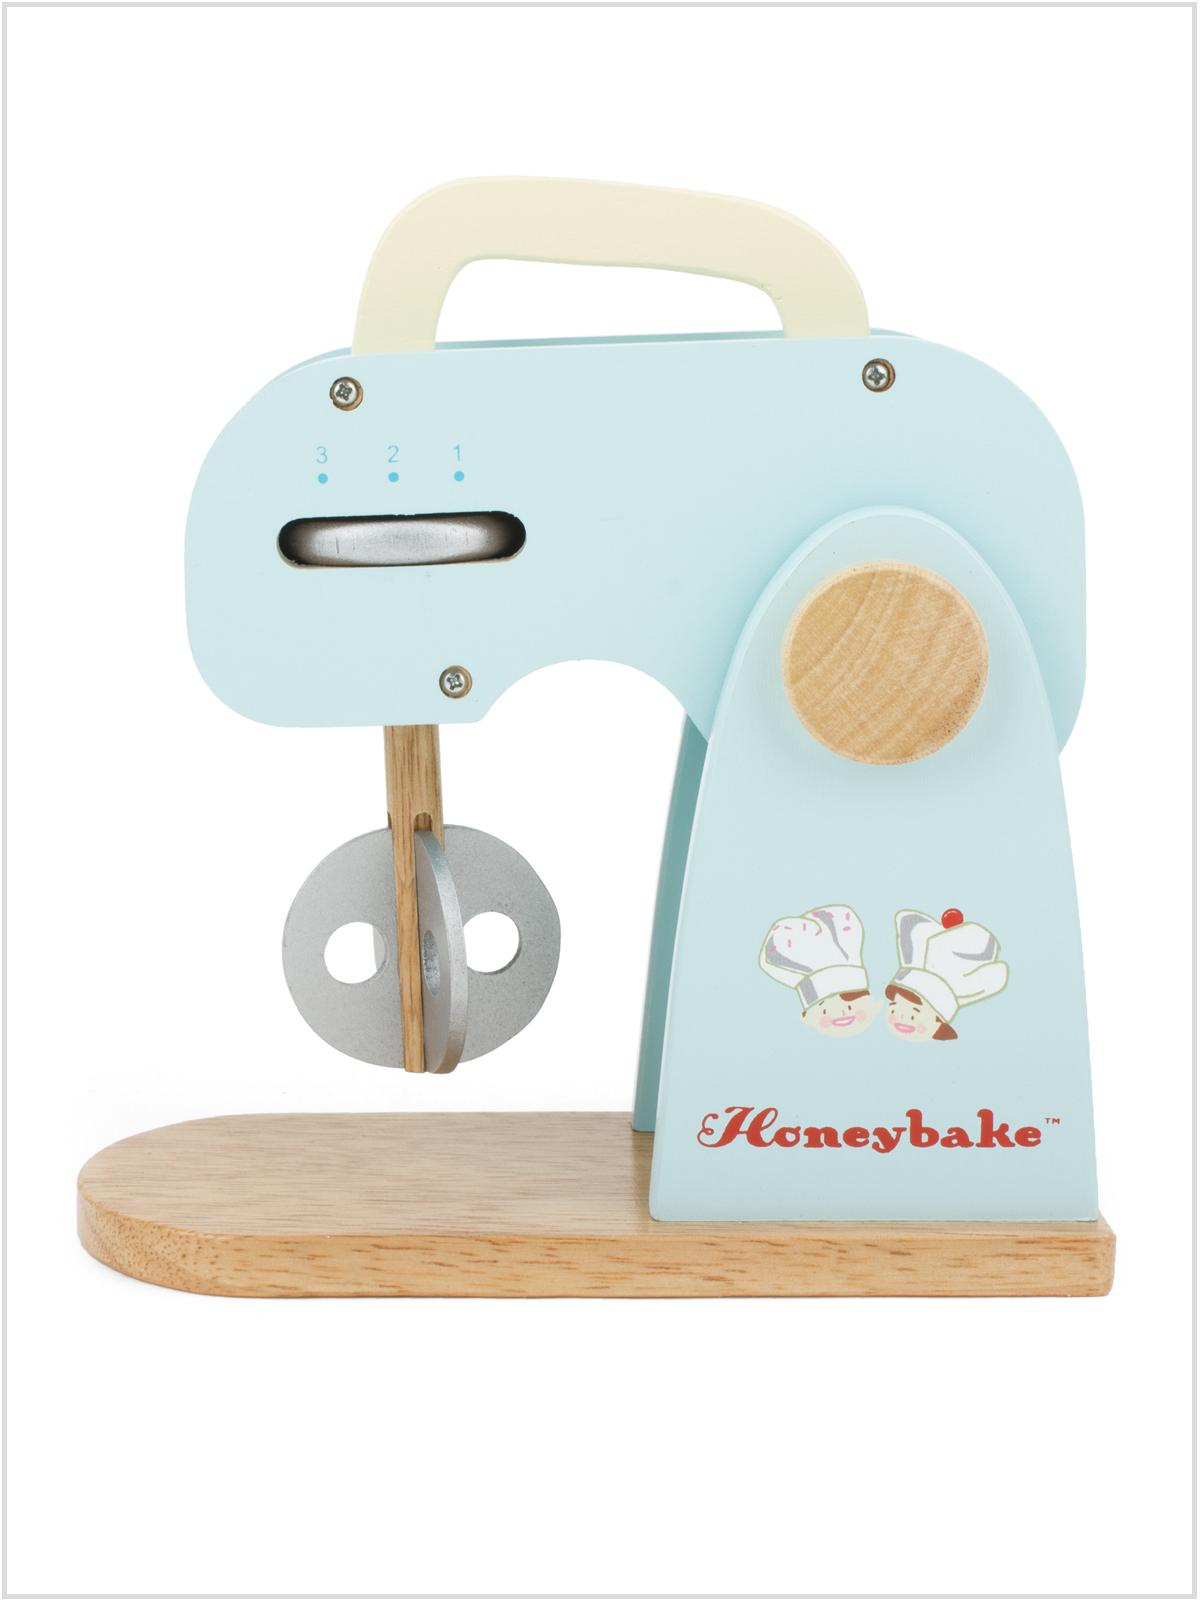 frederickandsophie-toys-letoyvan-honeybake-play-wooden-mixer